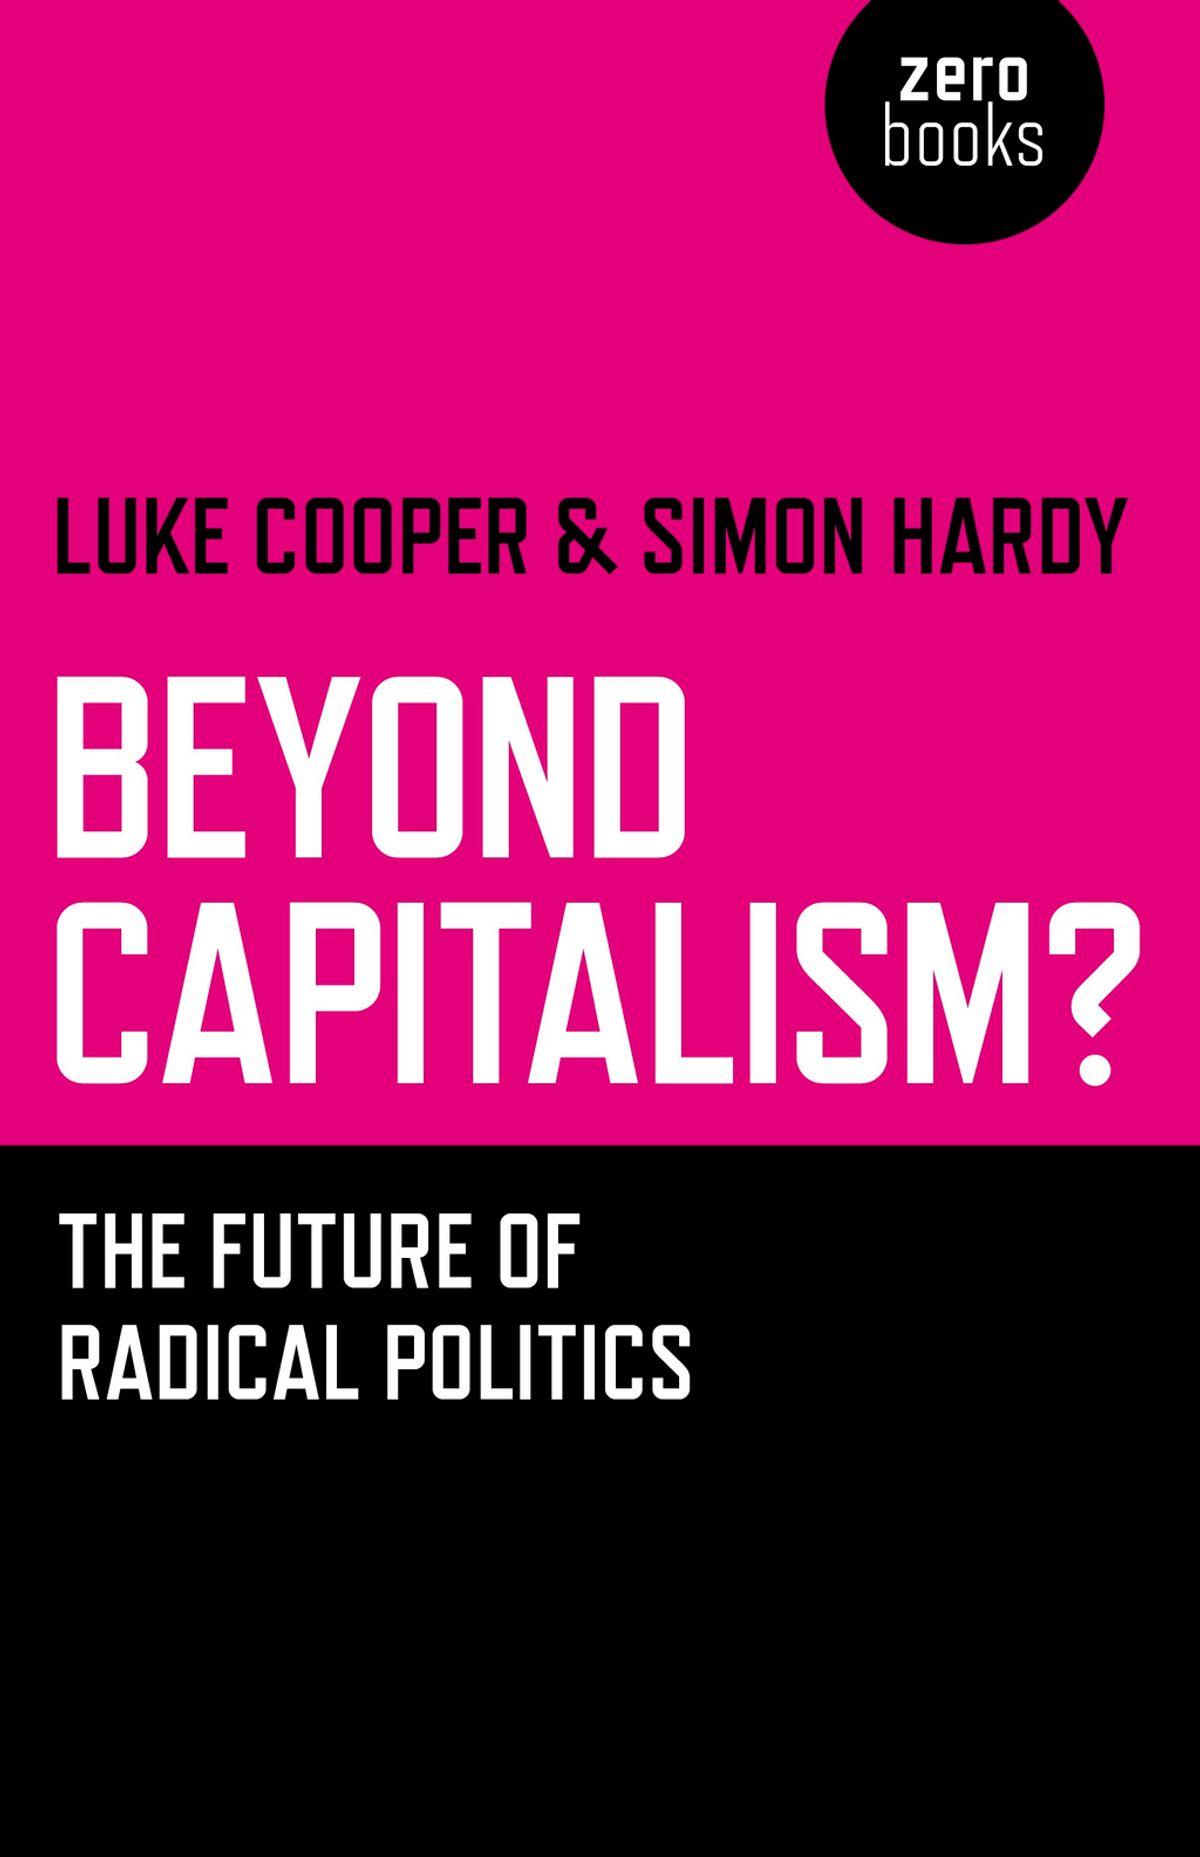 Luke Cooper, Simon Hardy: Beyond Capitalism - The Future of Radical Politics